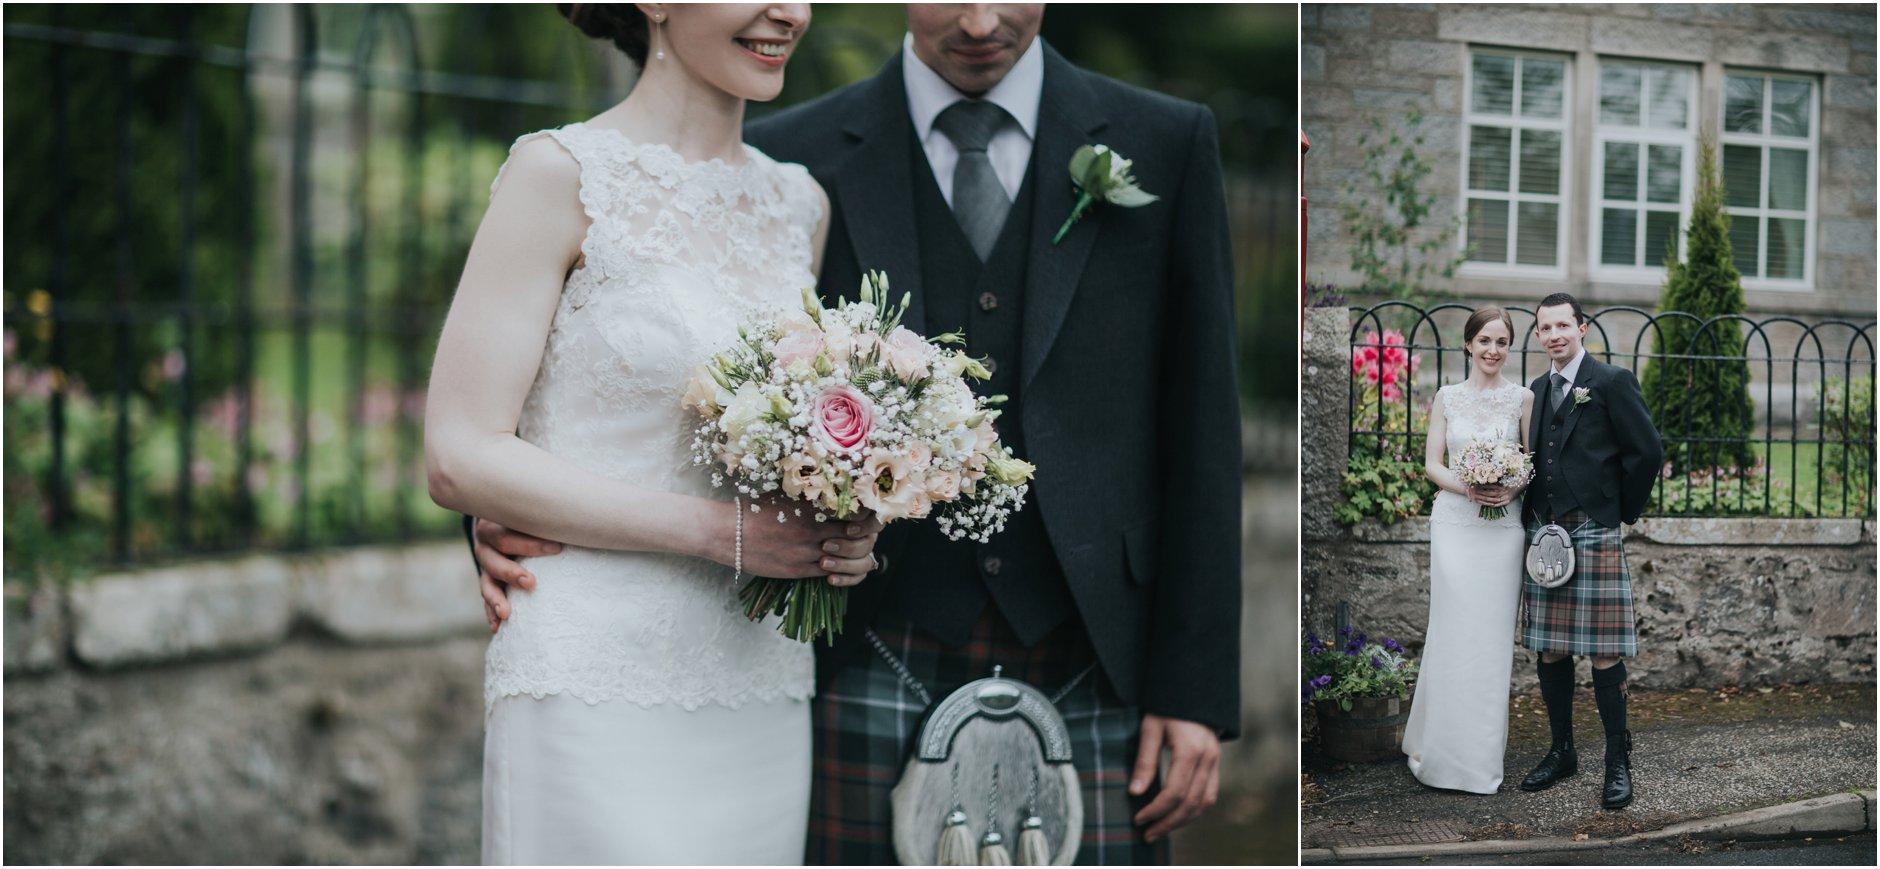 aberdeen aberdeenshire creative natural vintage wedding photographer